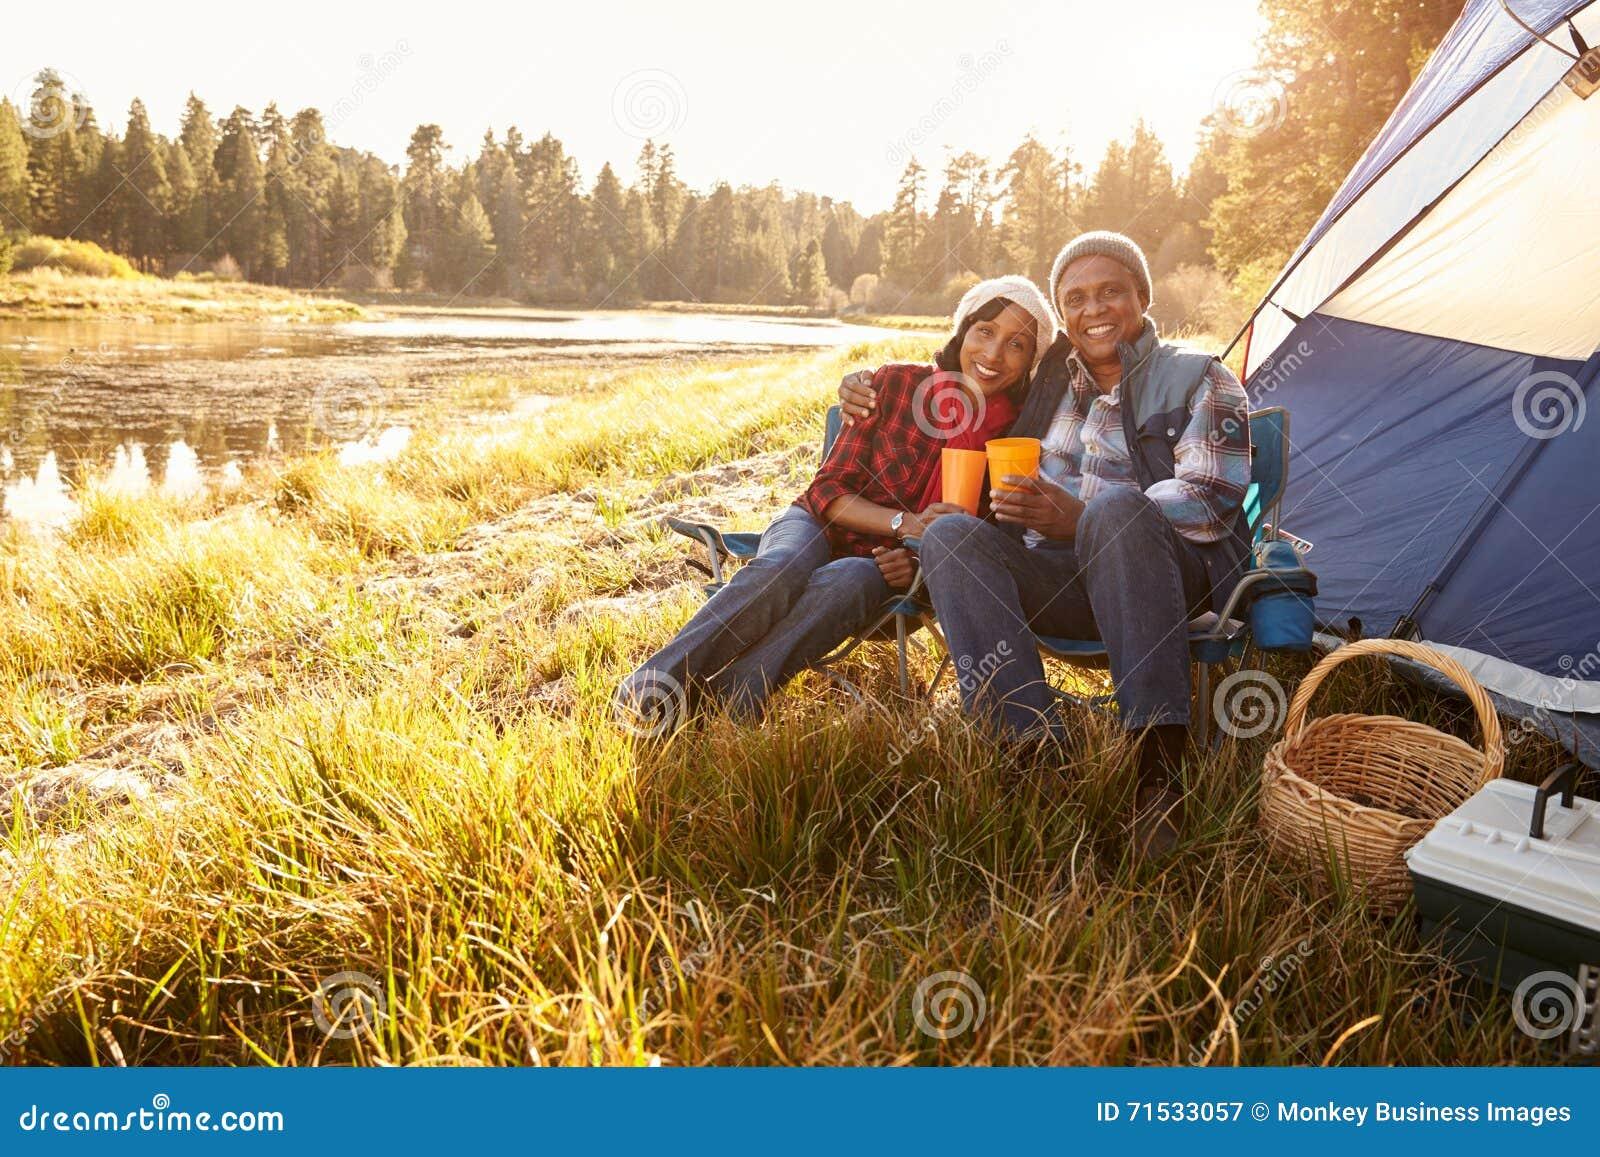 Portret van Hoger Paar op Autumn Camping Trip